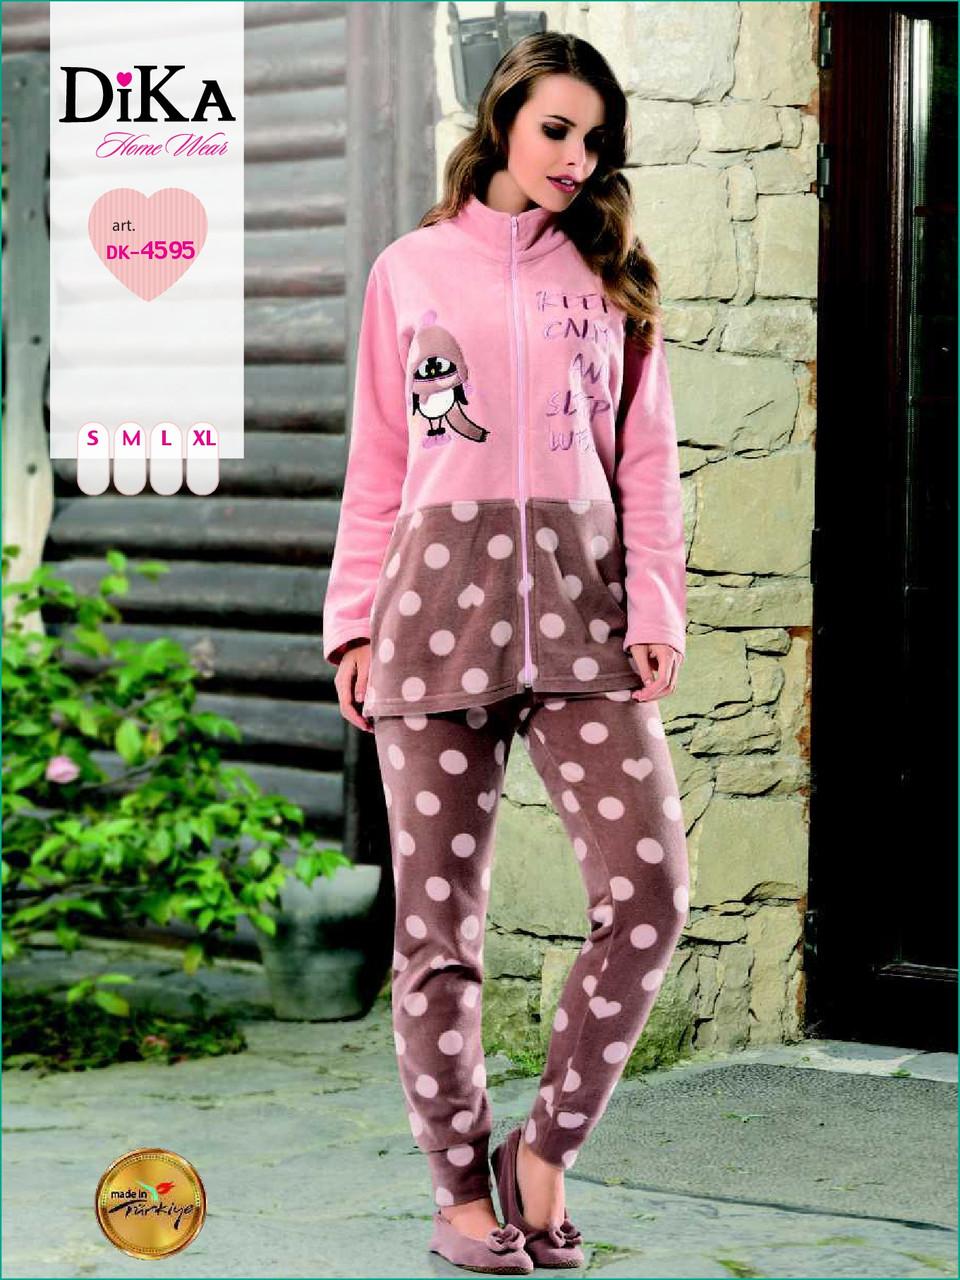 Пижама женская велсофт 4595 Dika